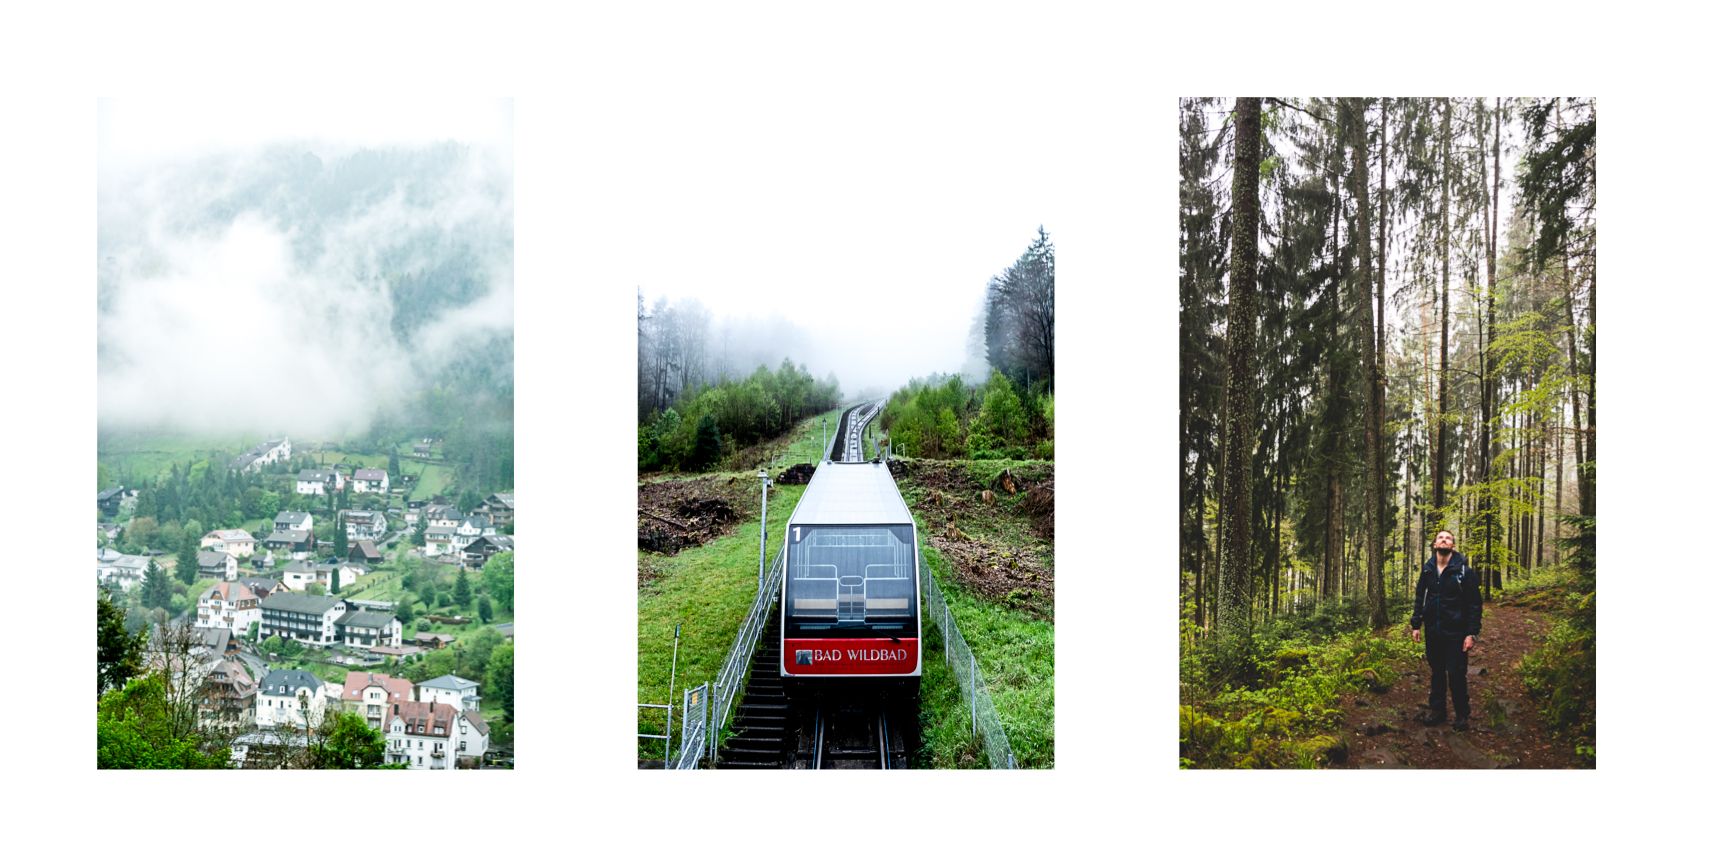 Bad Wildbad Sommerbergbahn Wanderweg